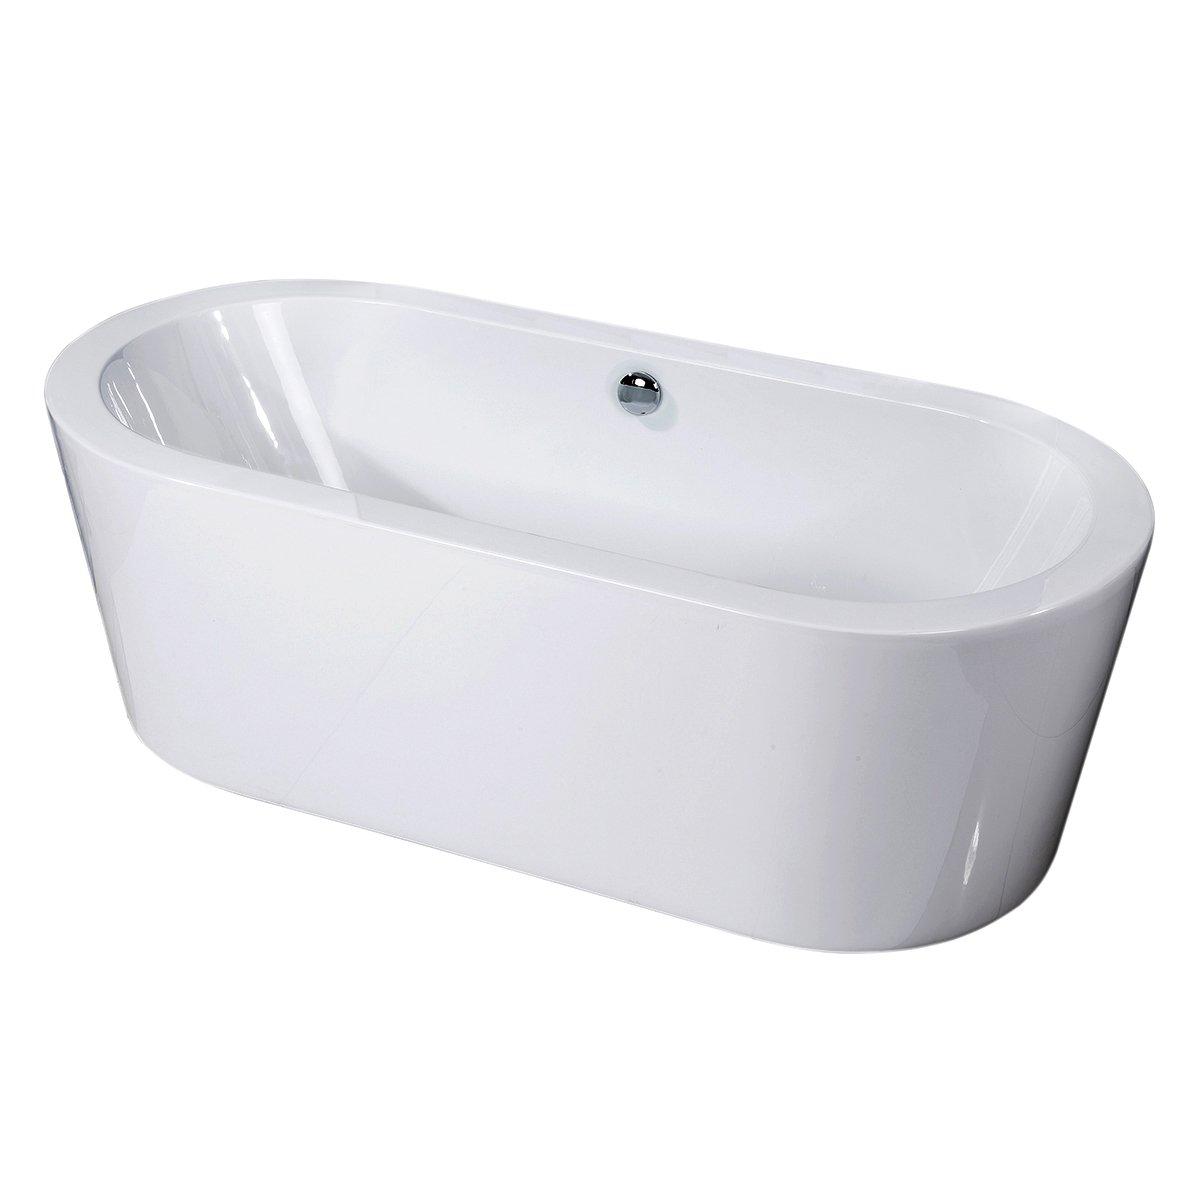 Acrylic Soaking Bathtub